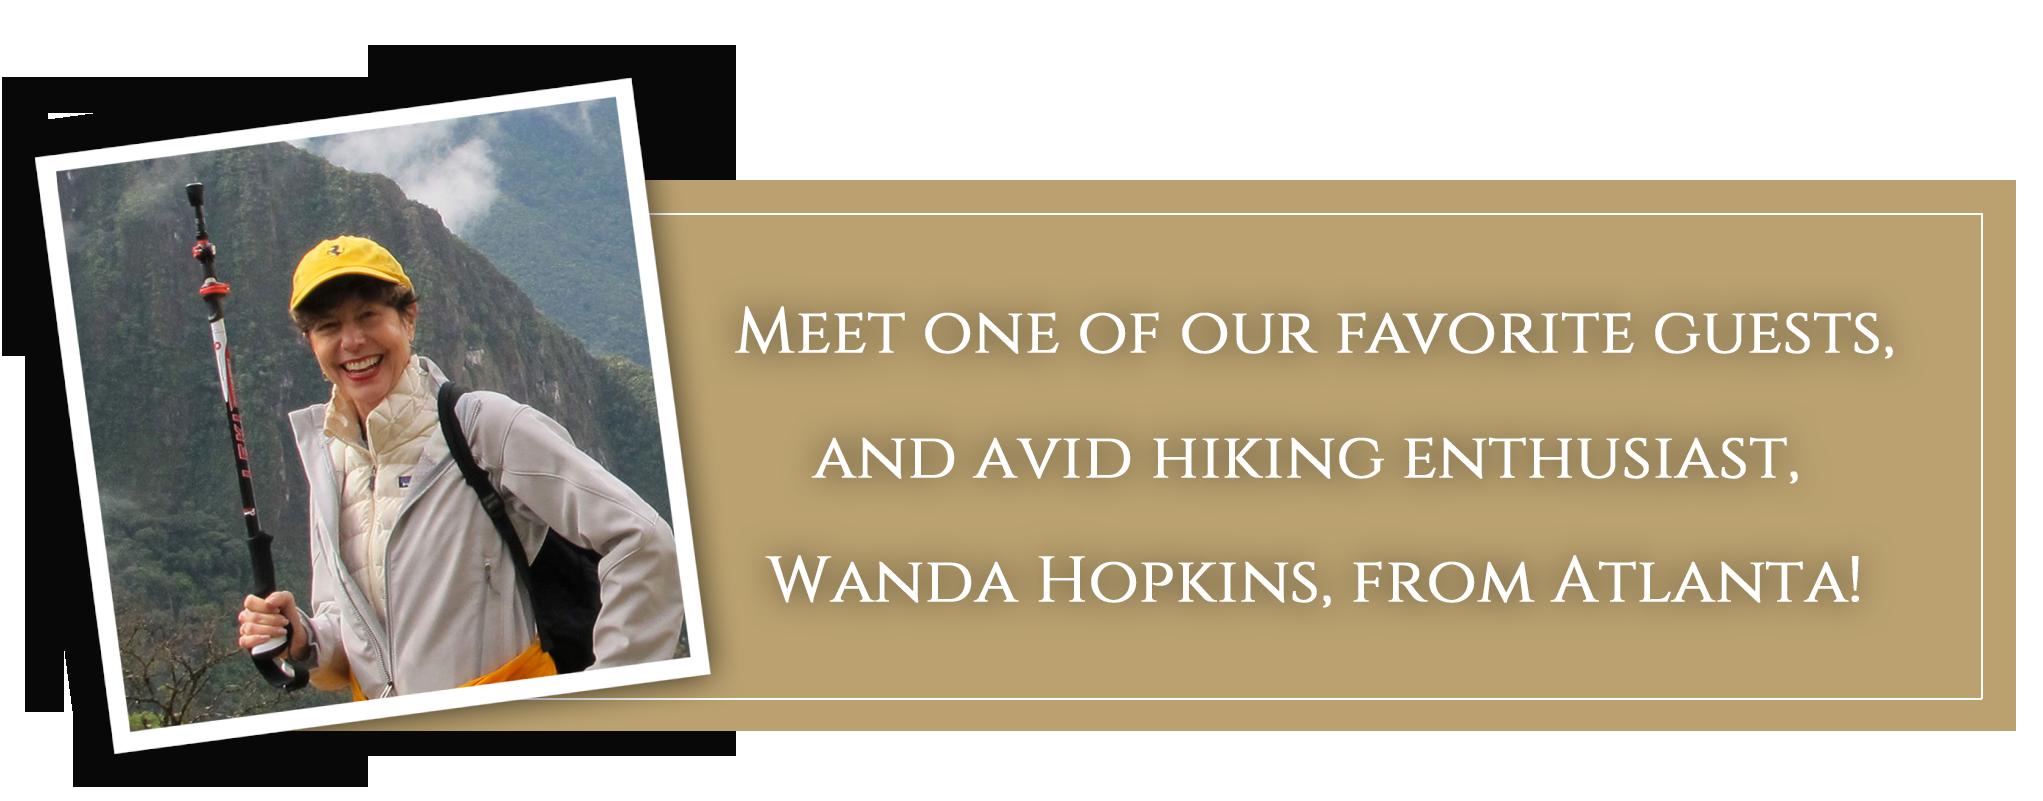 Hiking Trails Berkshires by Wanda Hopkins